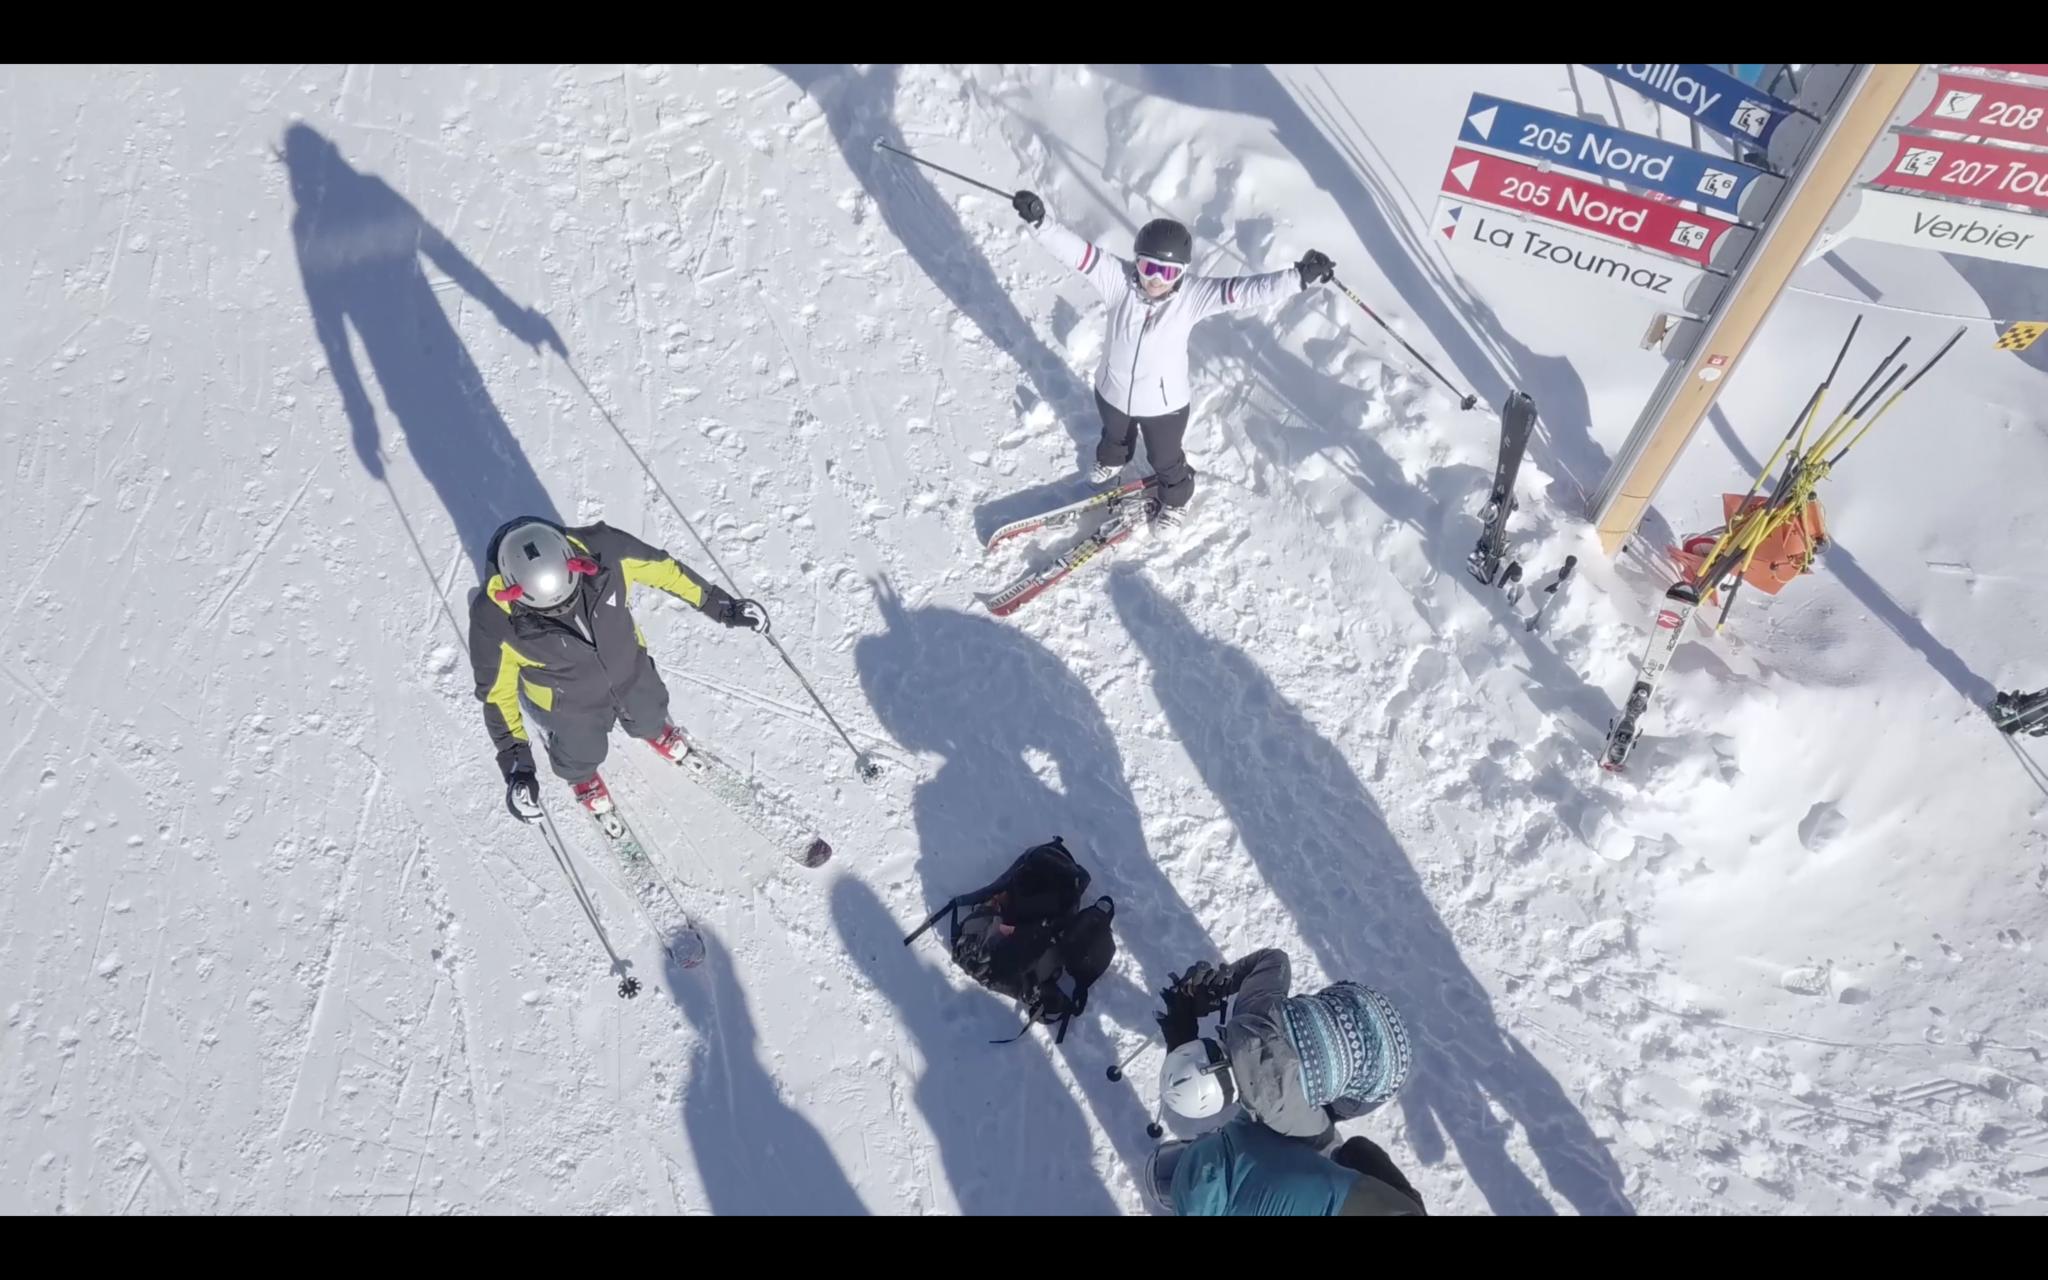 Snowsports now on display!